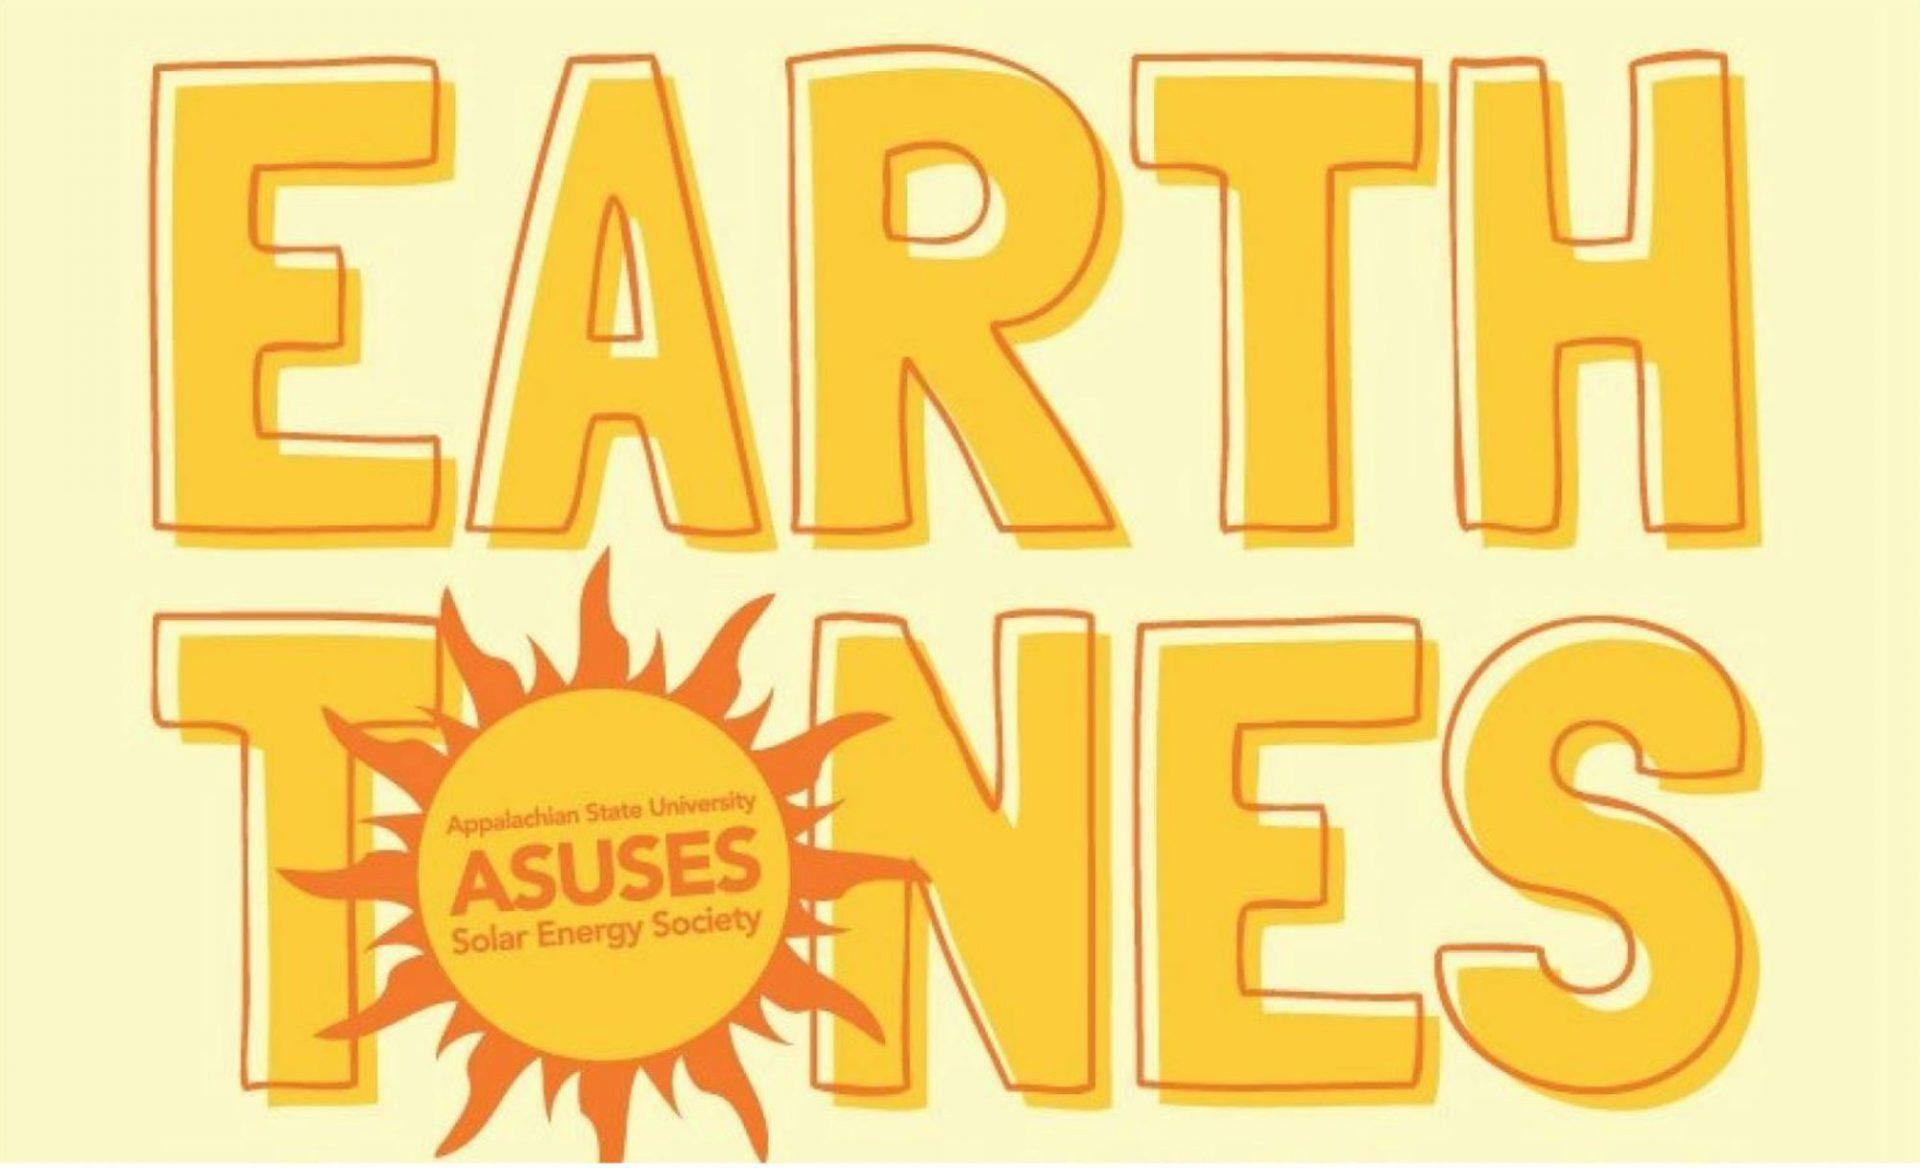 Solar Energy Society aims to educate through Earth Tones music festival